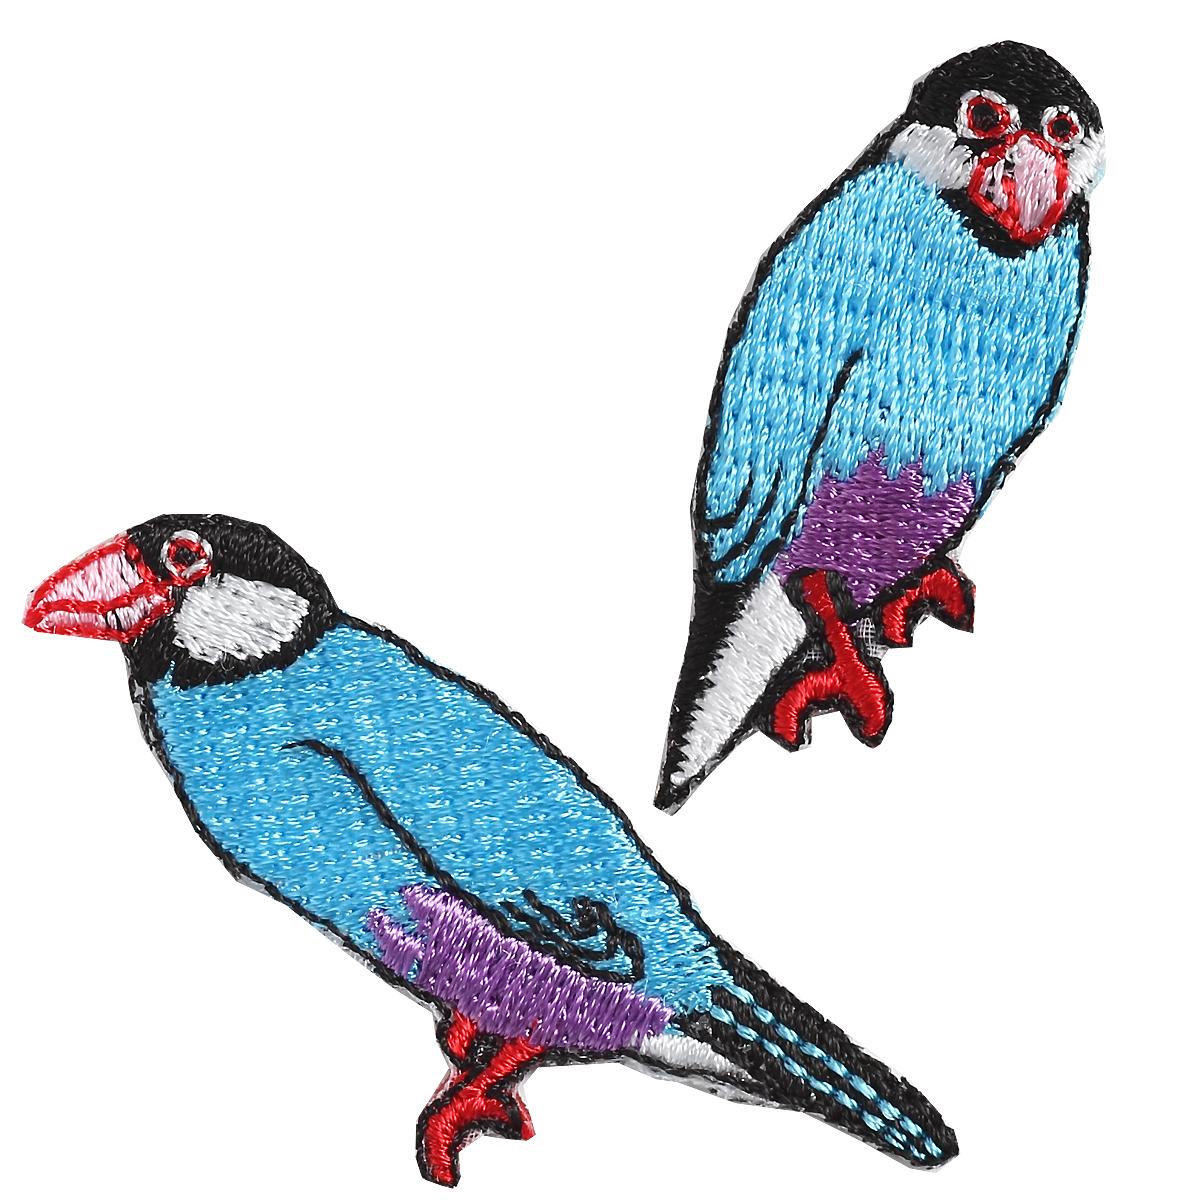 KYWS-702/ワッペン/文鳥/ぶんちょう/【DM便可】